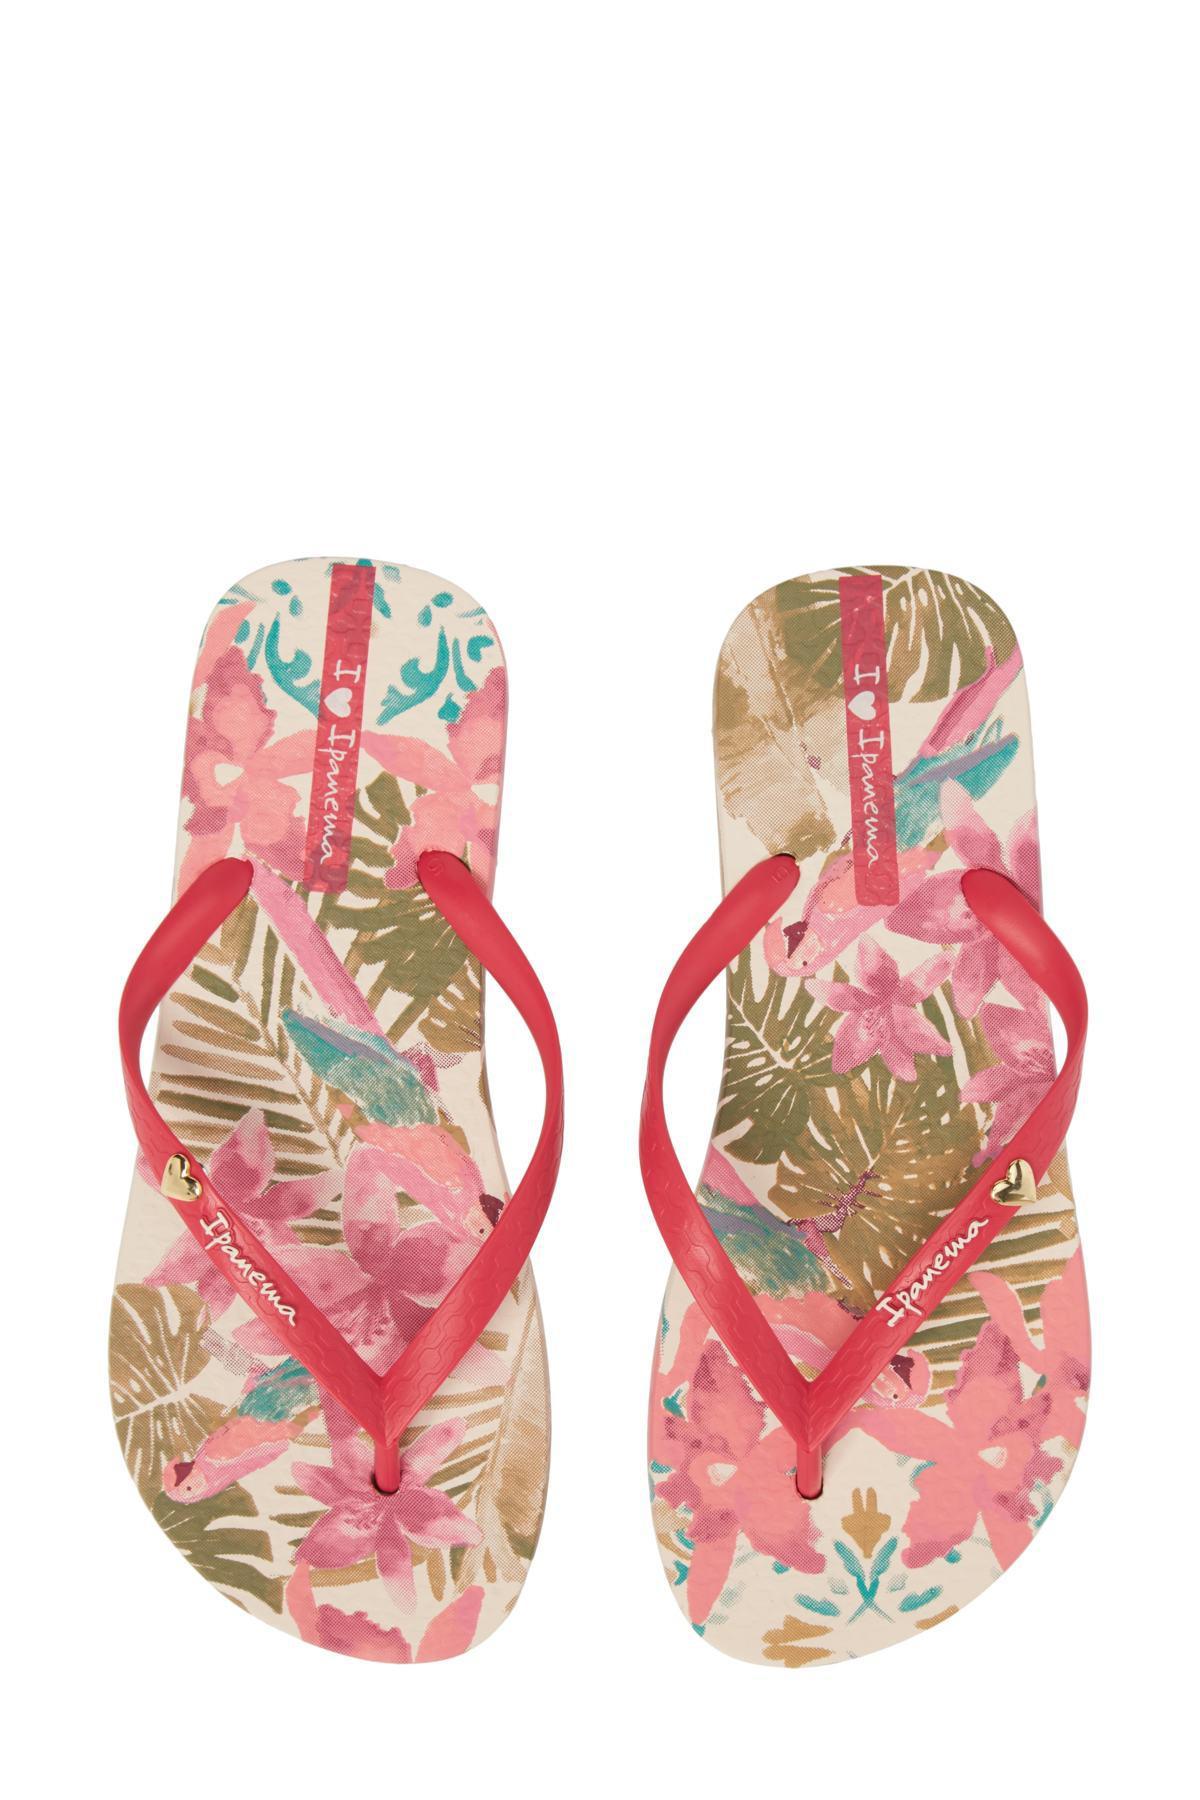 d71464c6ea7ca6 Lyst - Ipanema Lush Flip Flops in Pink